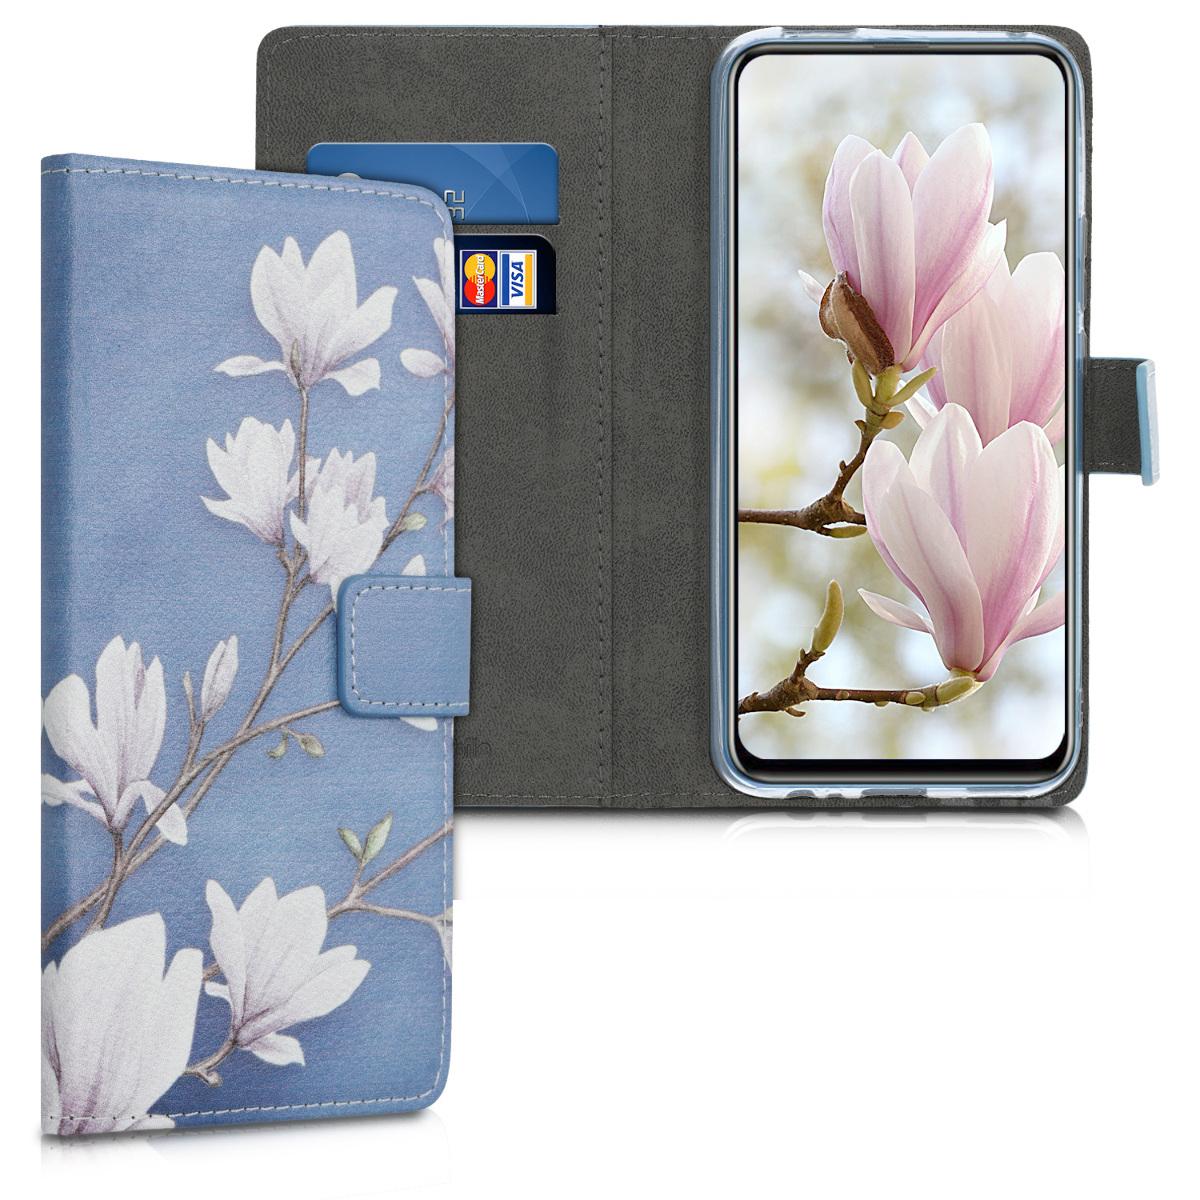 KW Θήκη Πορτοφόλι Huawei P Smart Z - Taupe / White / Blue Grey (49453.02)